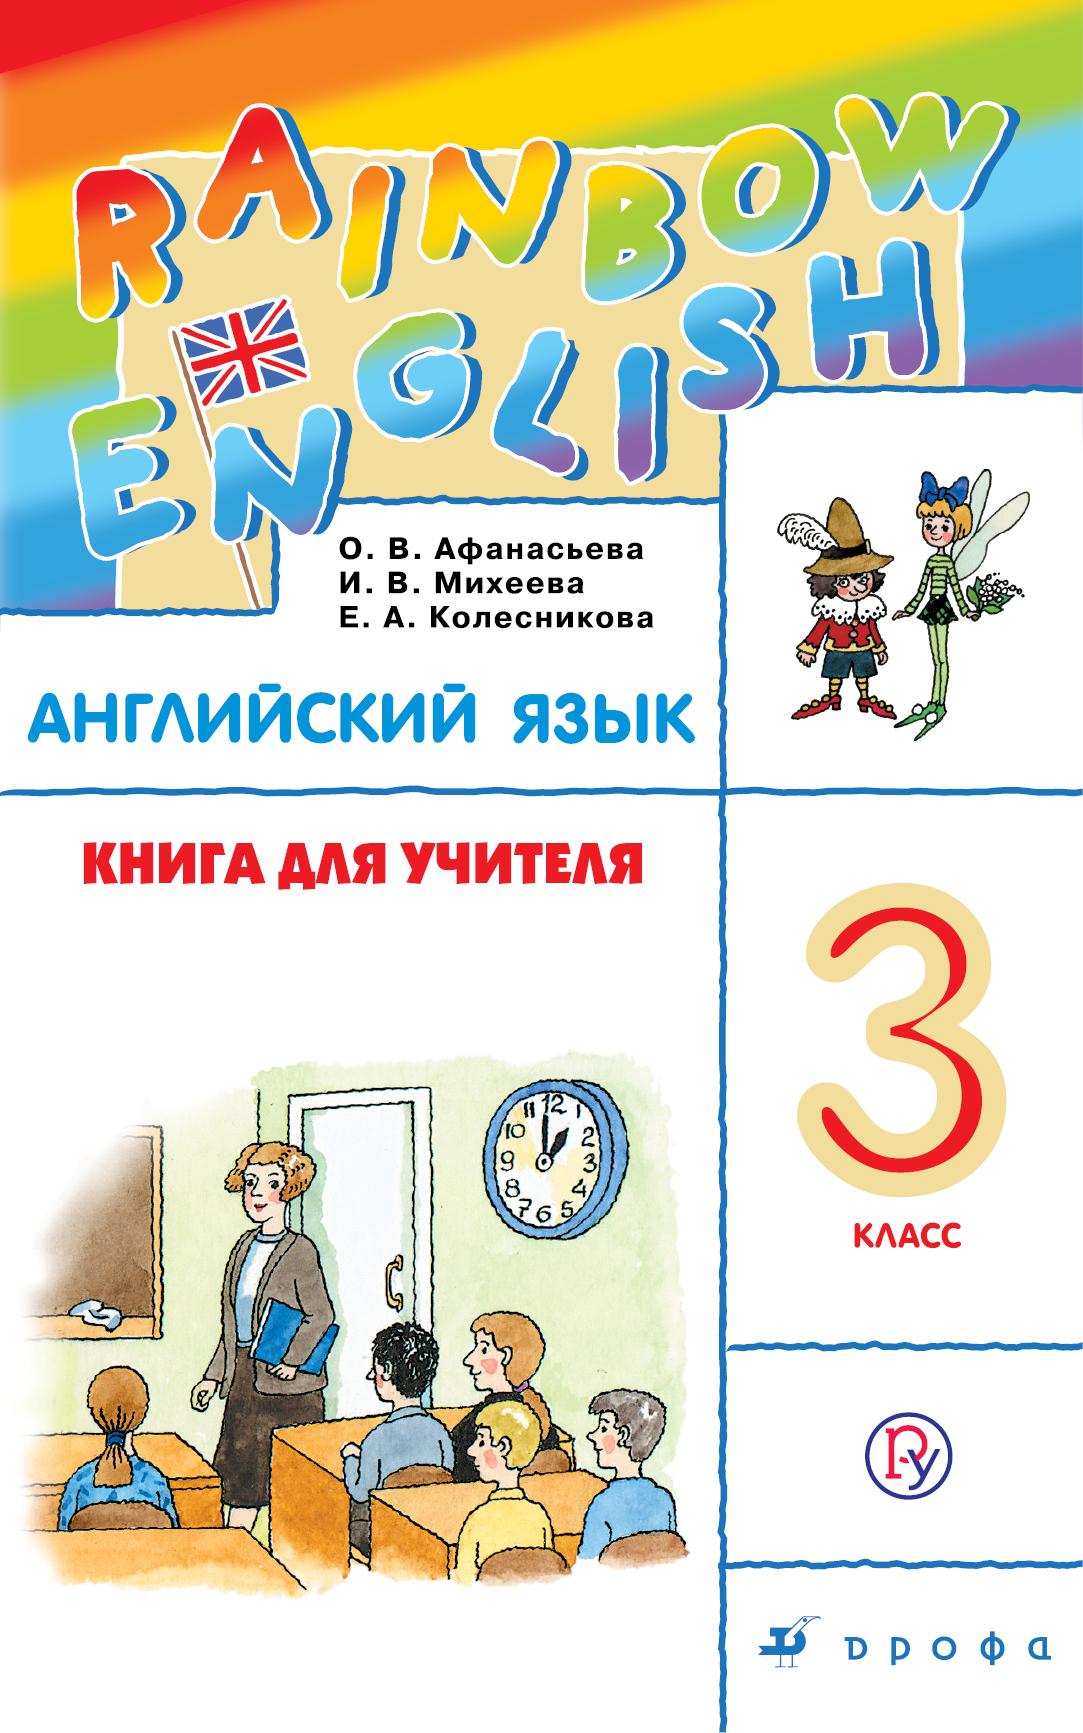 О. В. Афанасьева, И. В. Михеева, Е. А. Колесникова Rainbow English / Английский язык. 3 класс. Книга для учителя